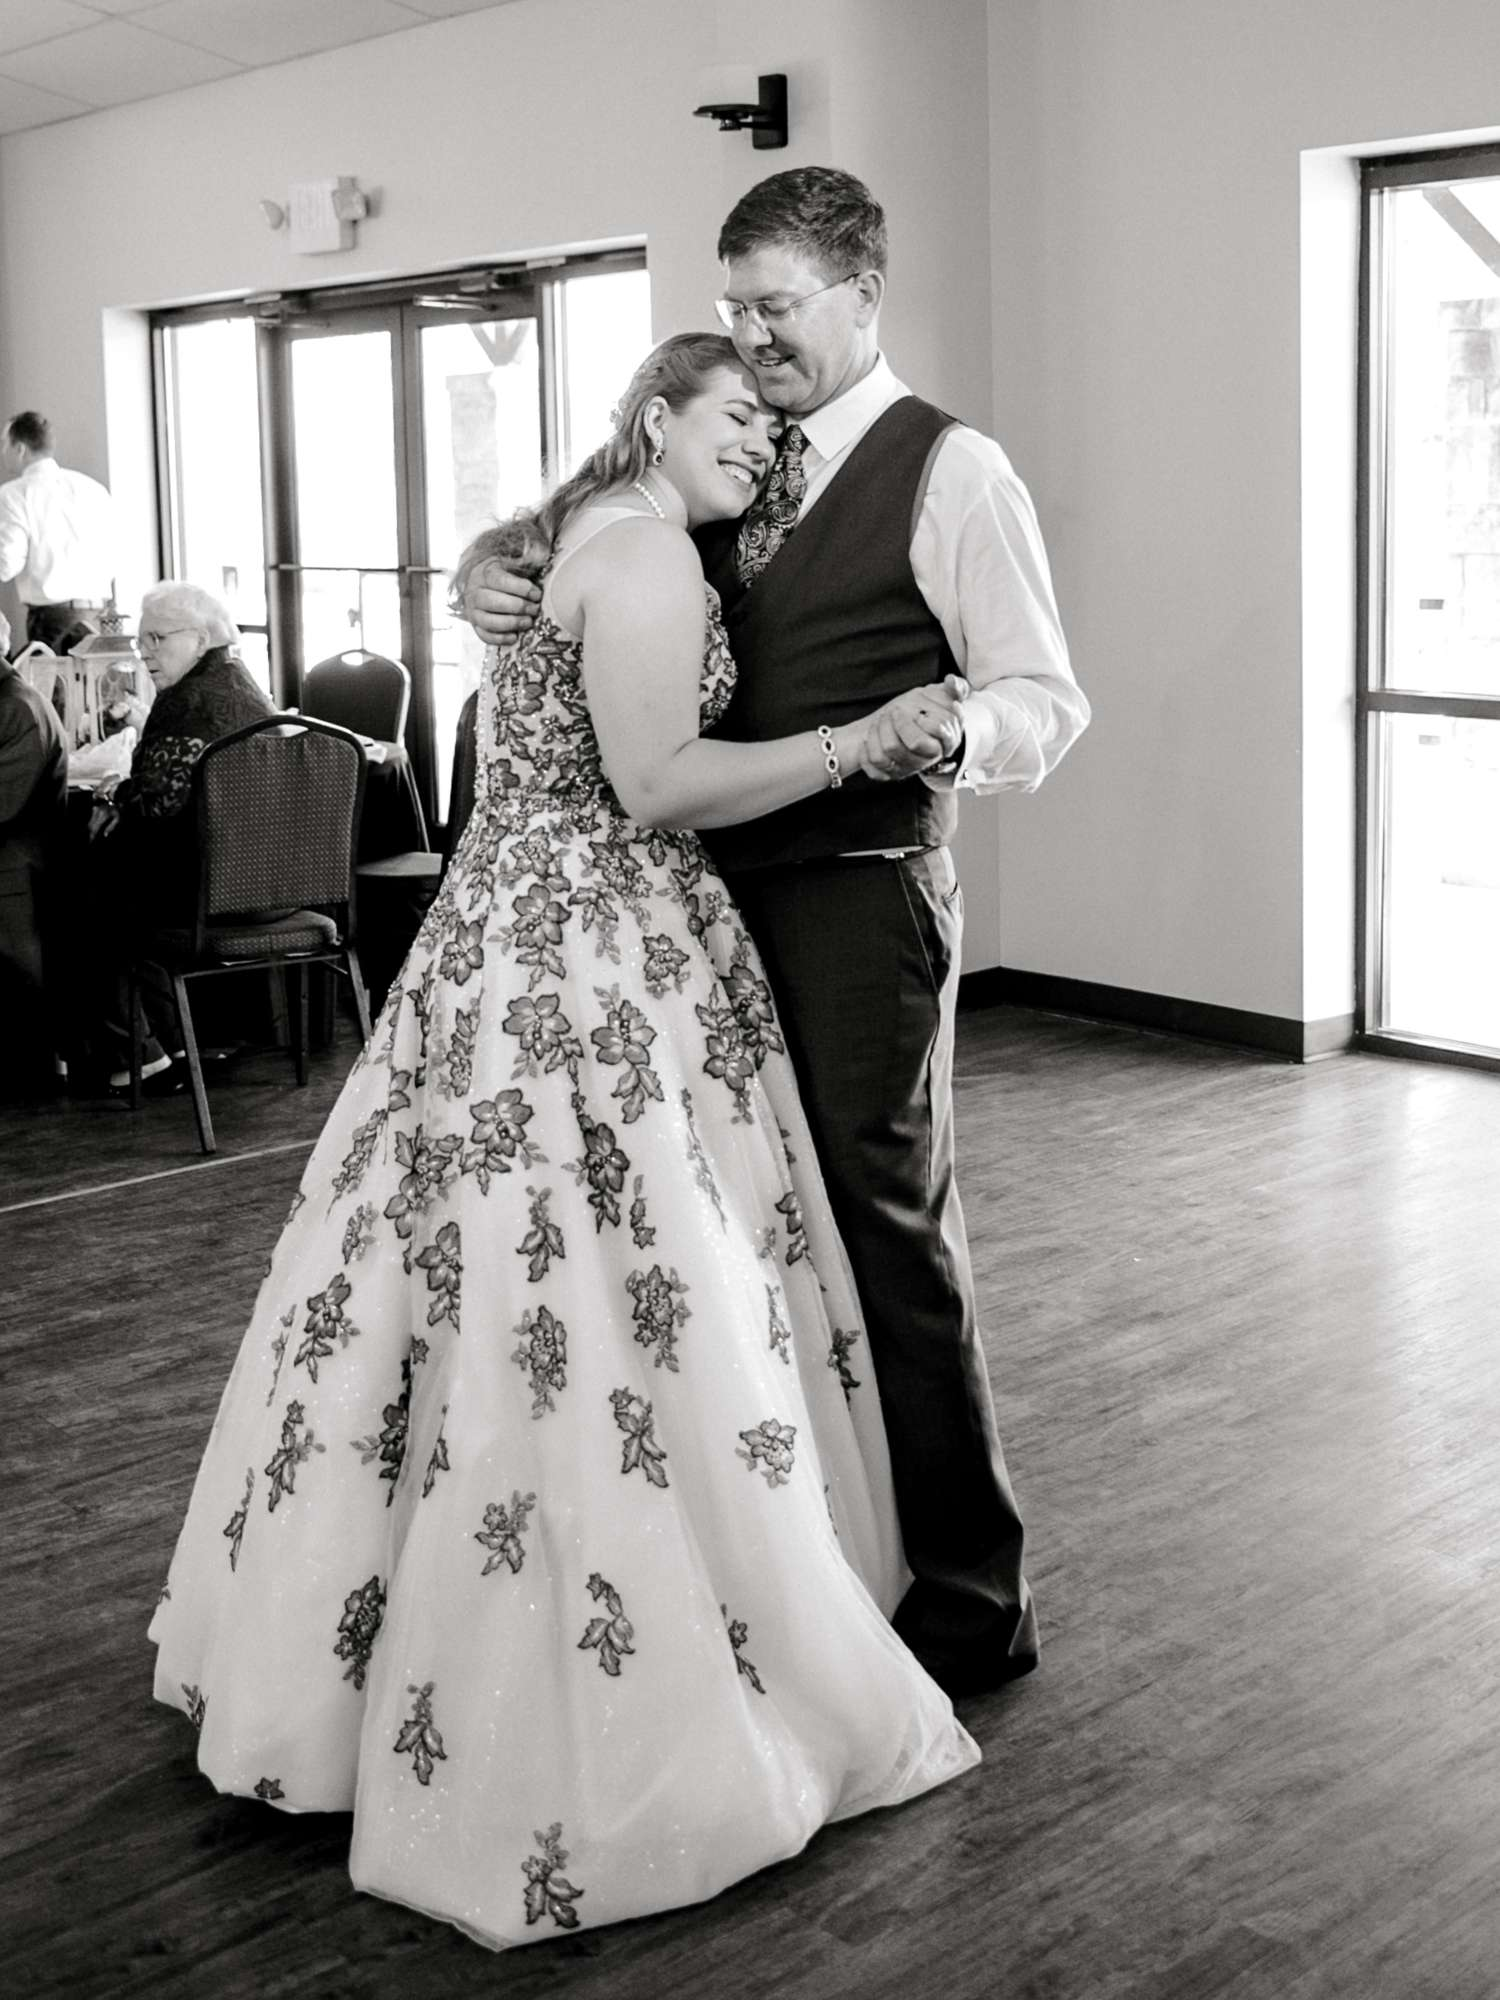 TY+NATHAN+HALLIER+ALLEEJ+WEDDING+PHOTOGRAPHER+RANSOM+CANYON_0110.jpg